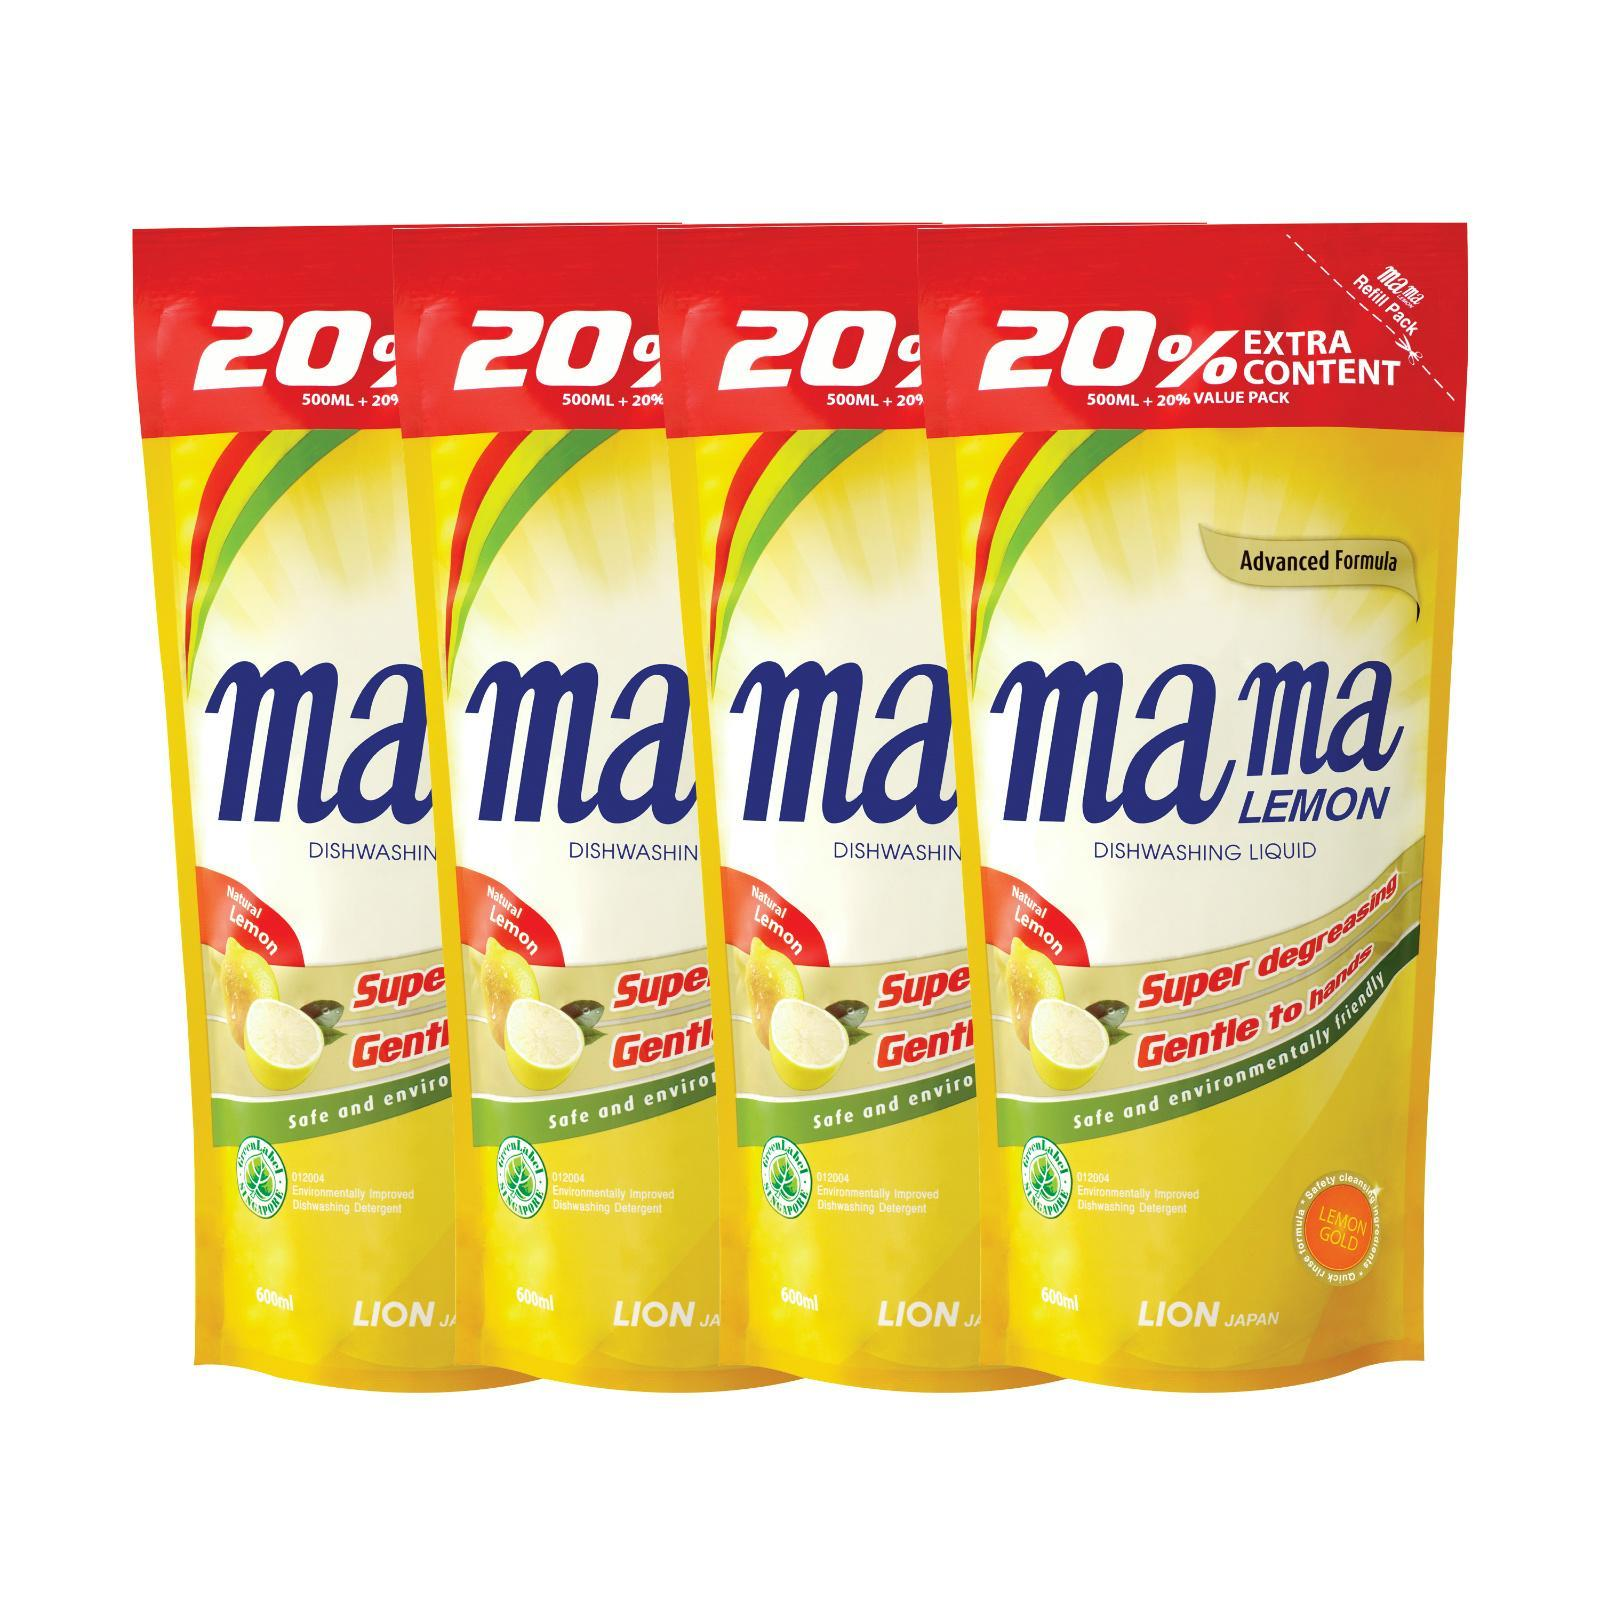 MAMA LEMON Dishwashing Liquid Refill - Lemon 4sX600ml